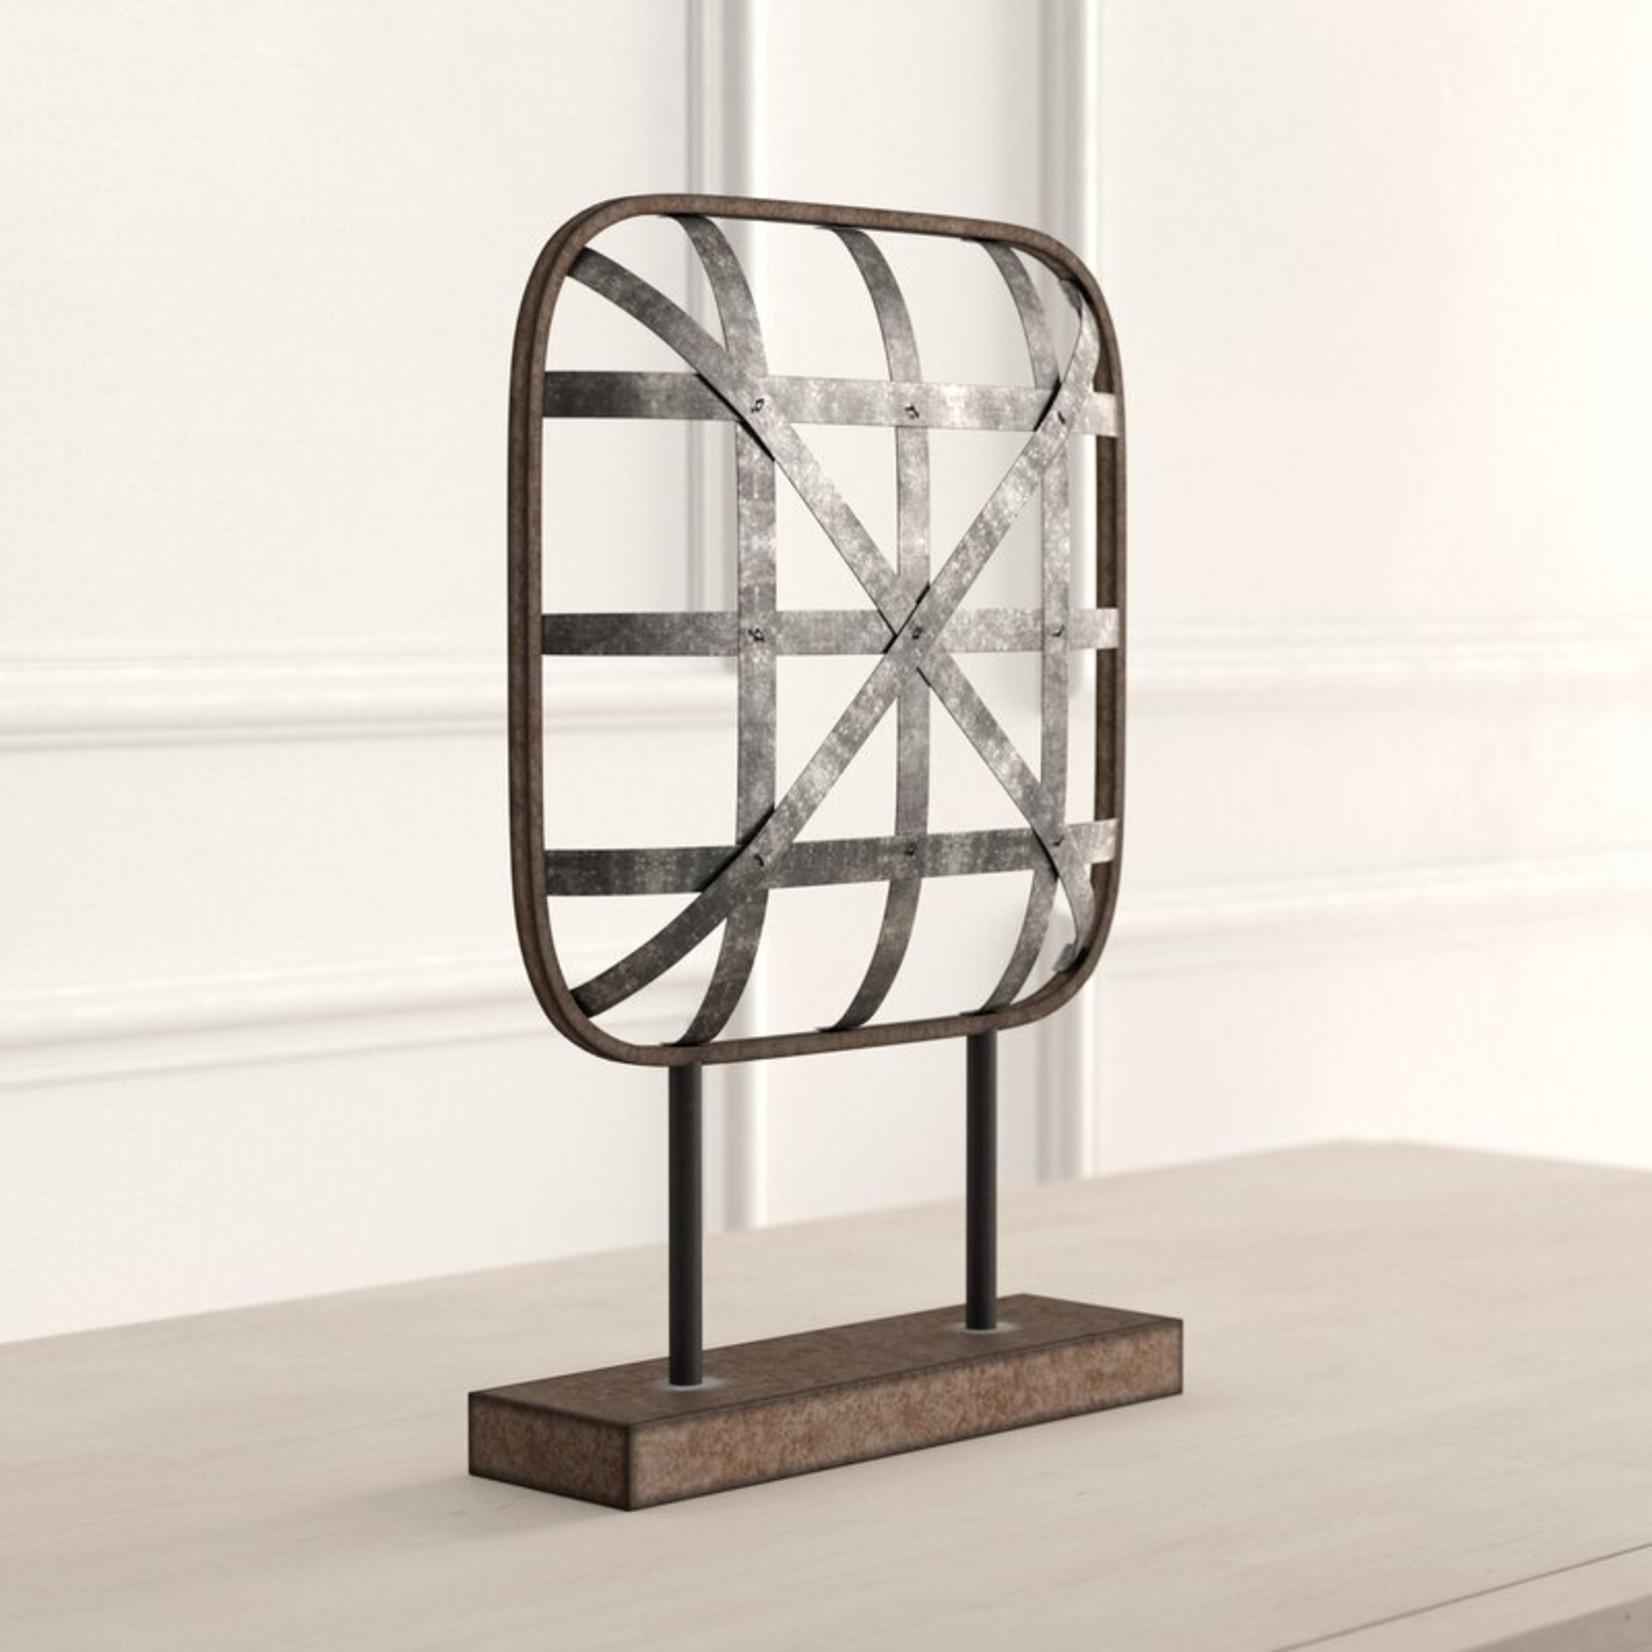 *Feliz Square Cross Hatched Metal Table Sculpture